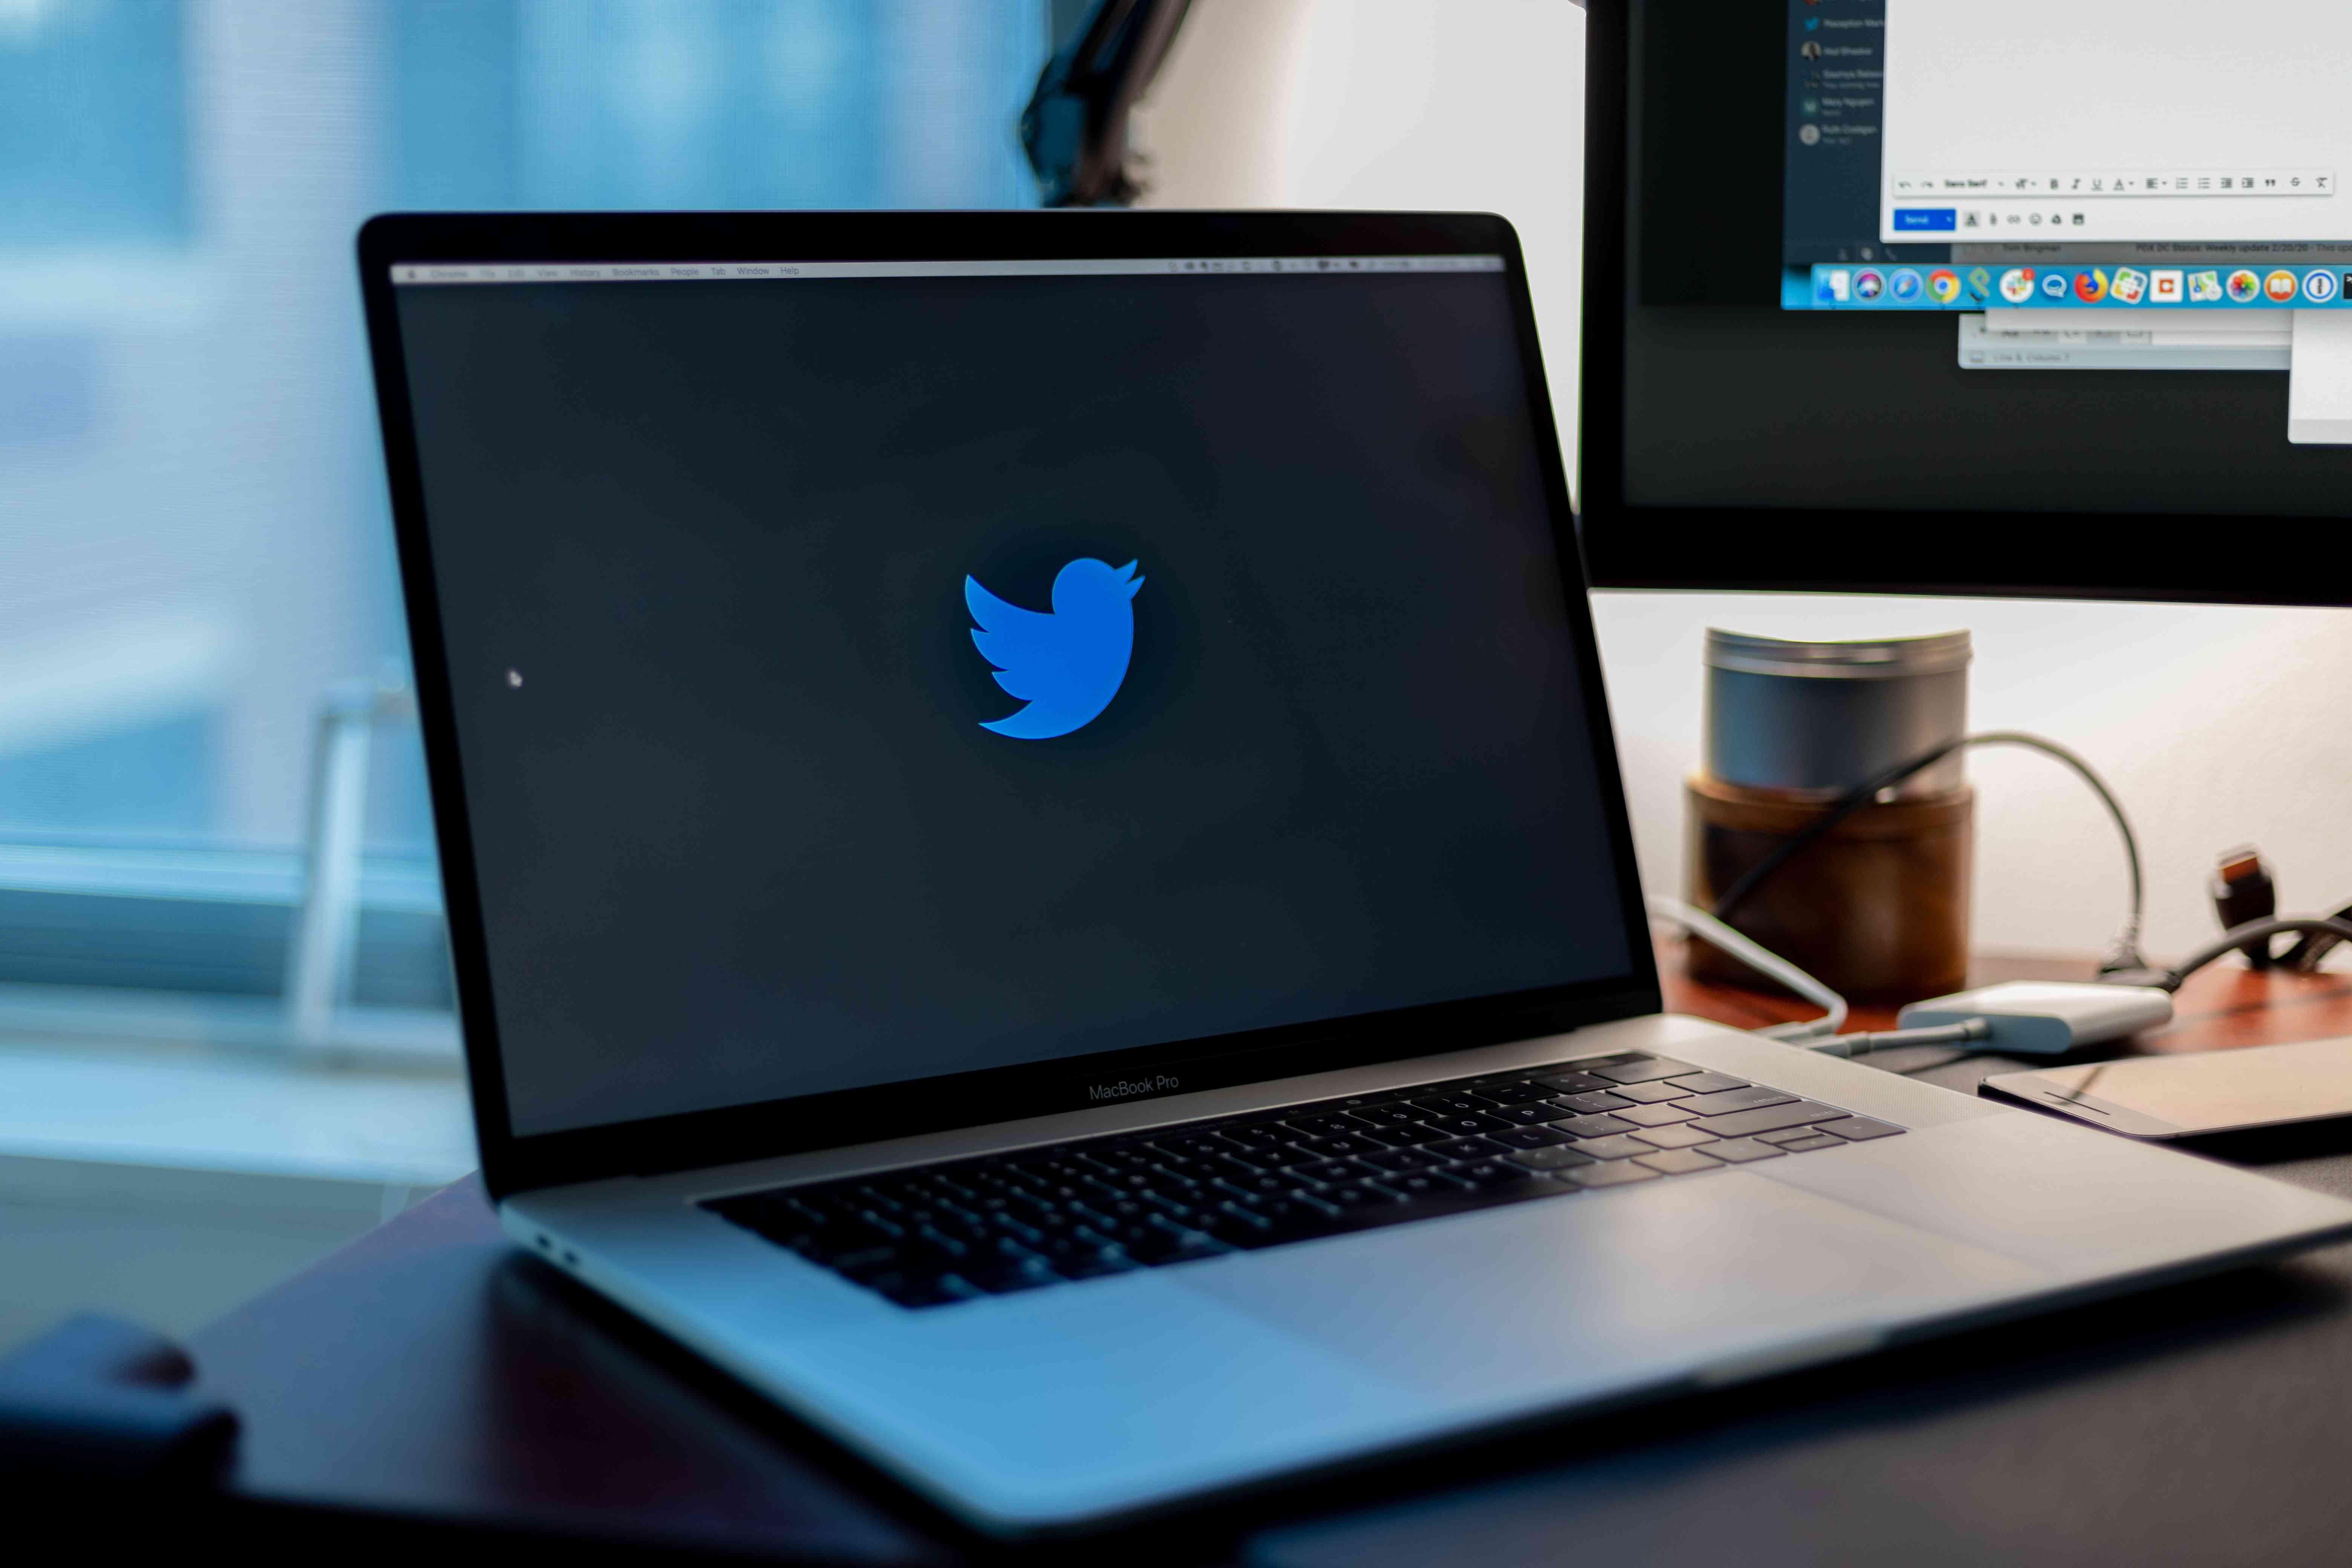 Twitter logo on a laptop